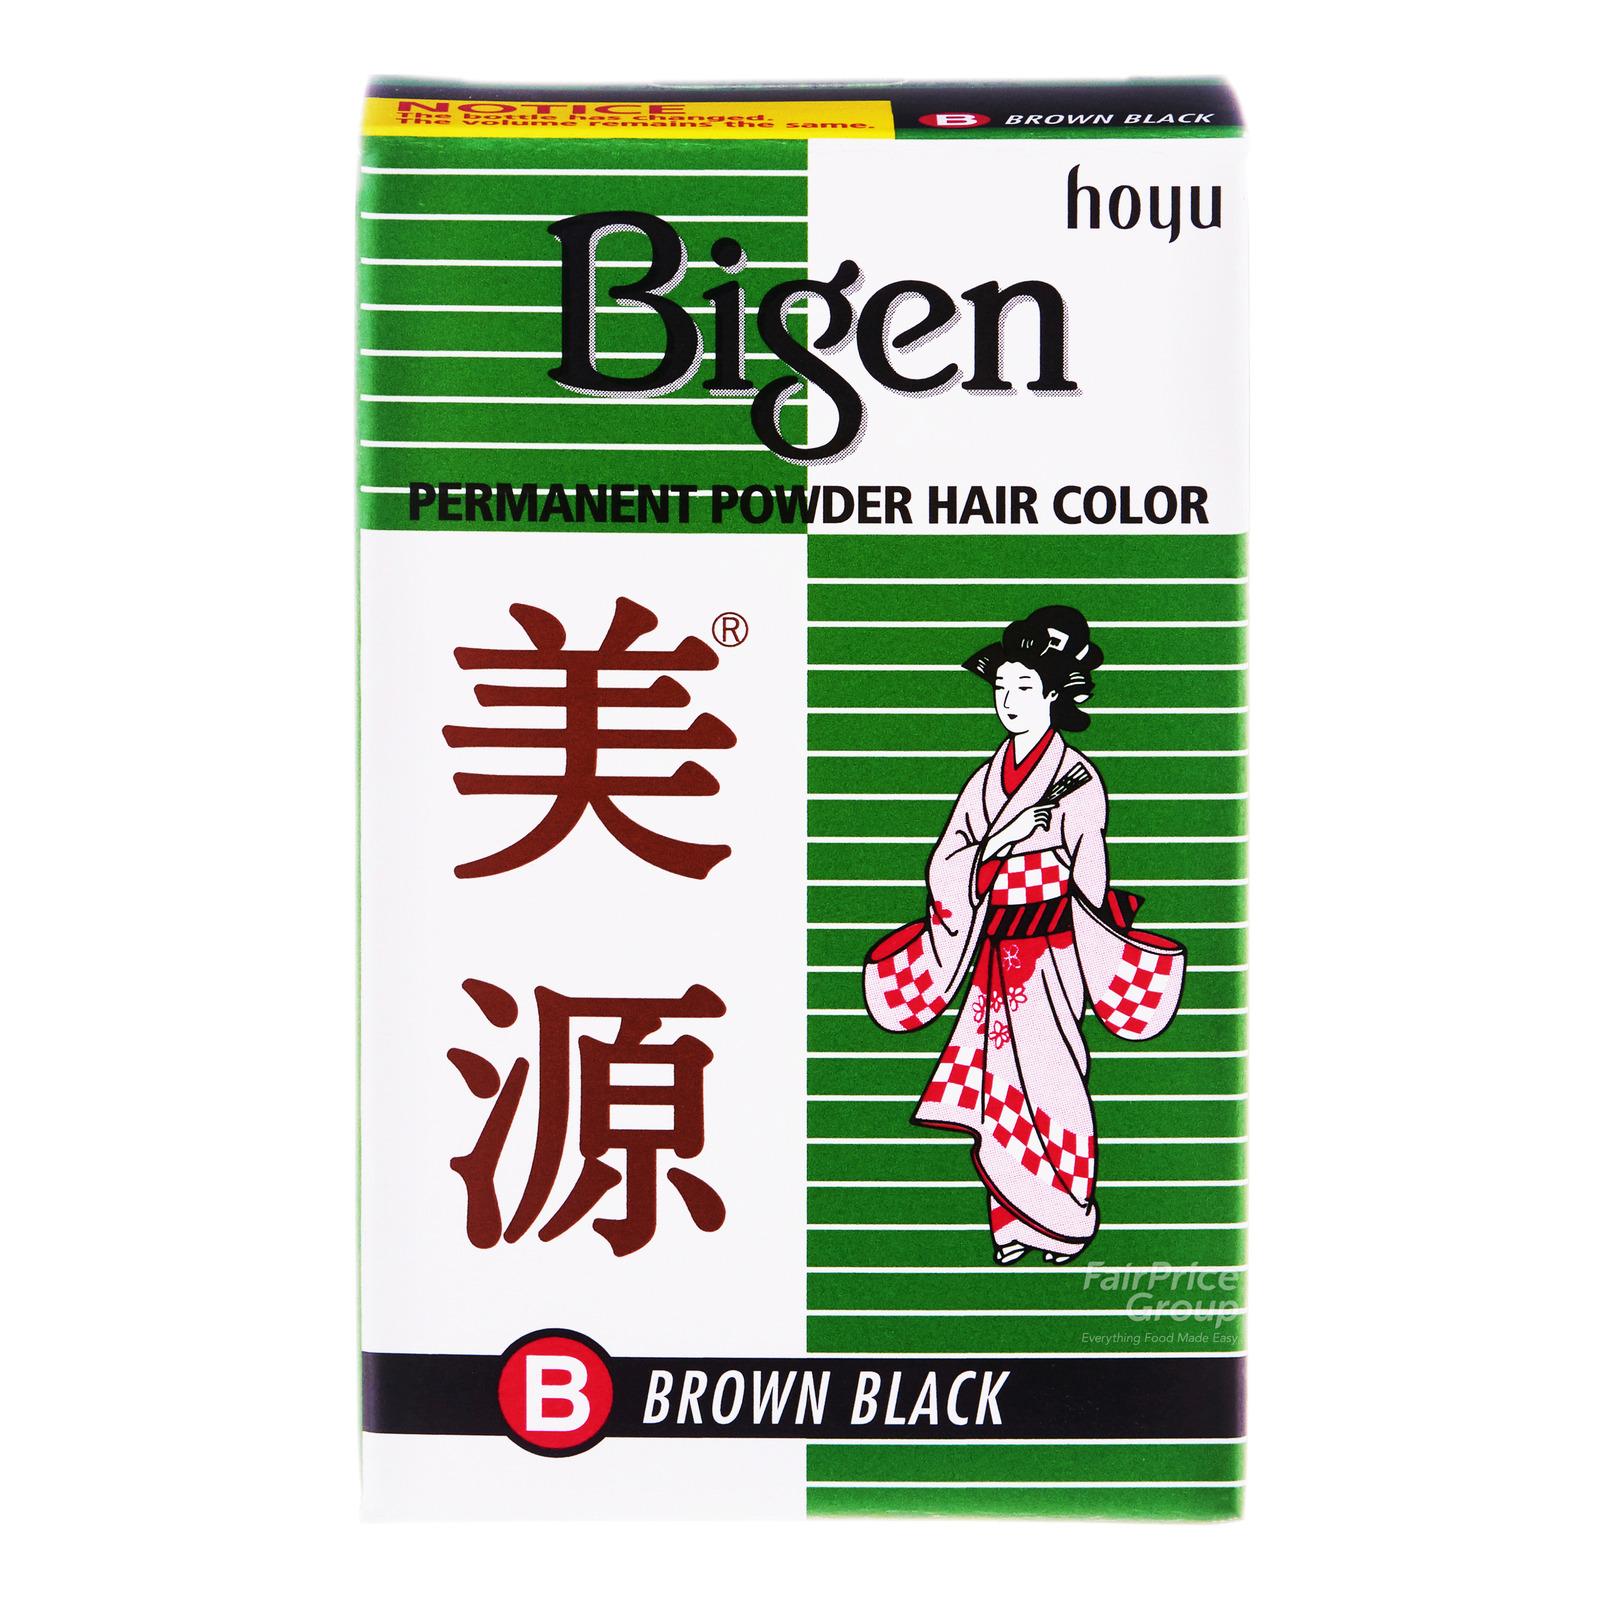 Bigen Permanent Powder Hair Colour - B Brown Black